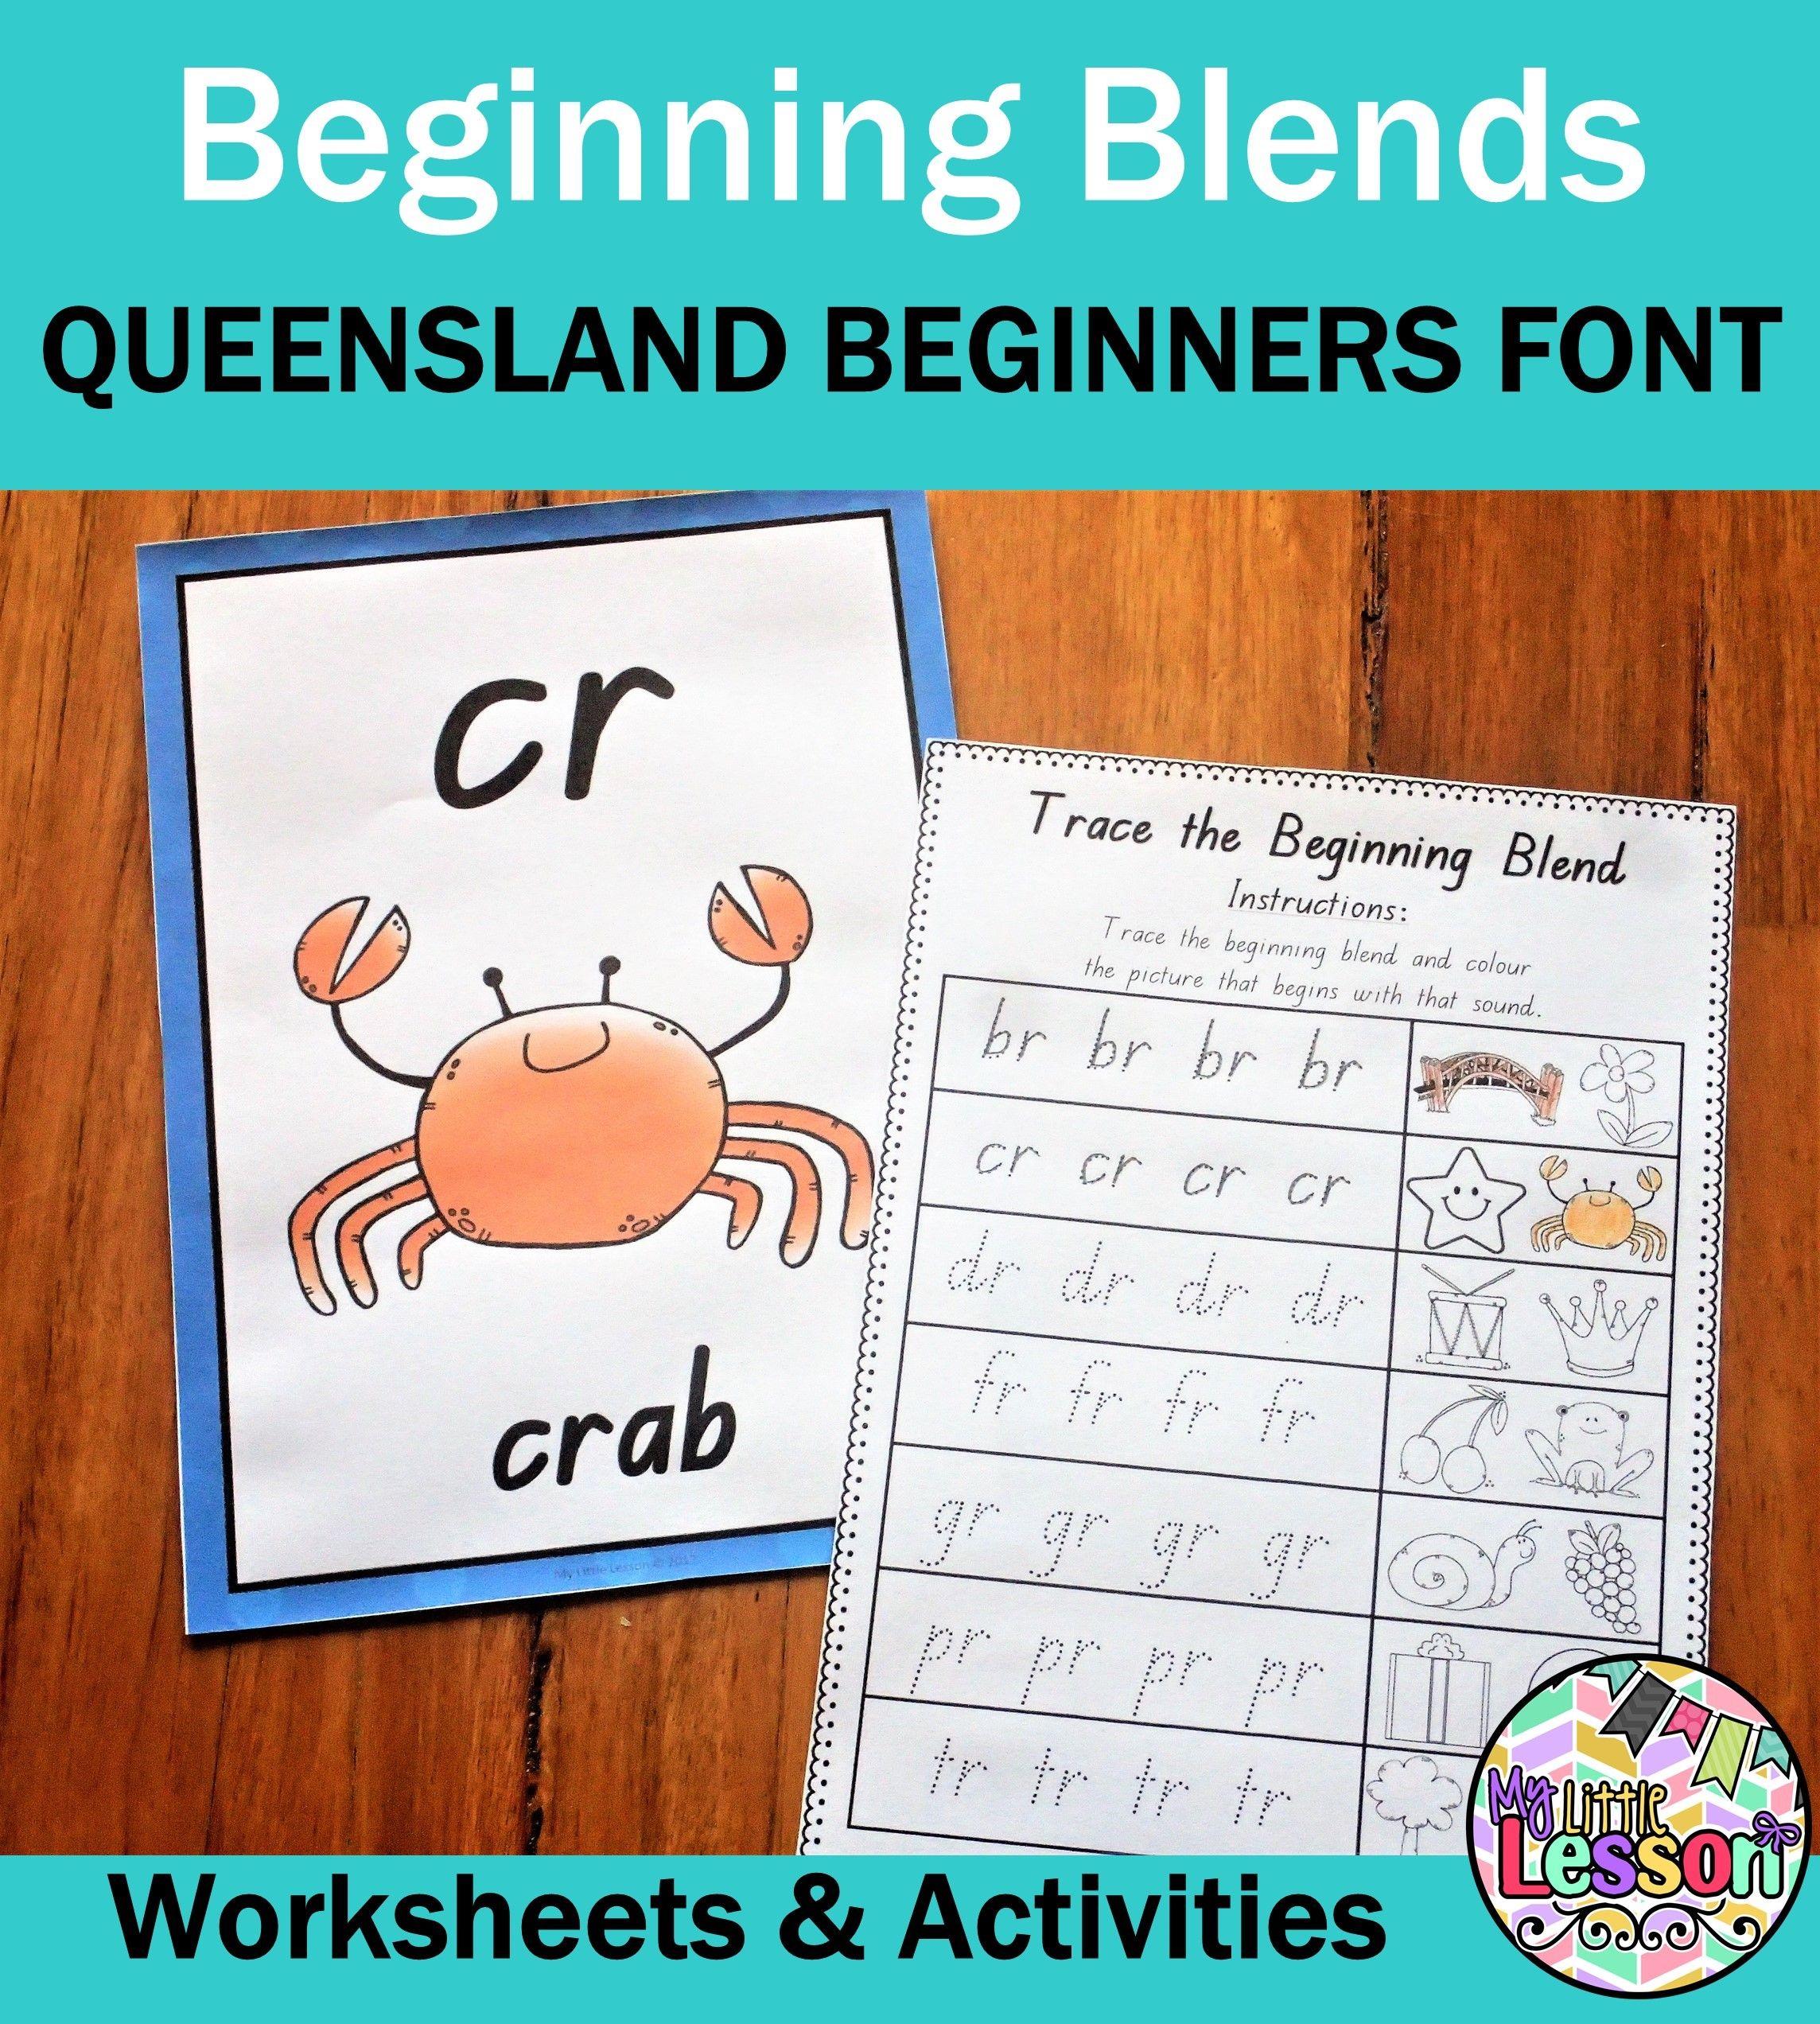 Beginning Blends Br Cr Dr Fr Gr Pr Tr Qld Beginners Font